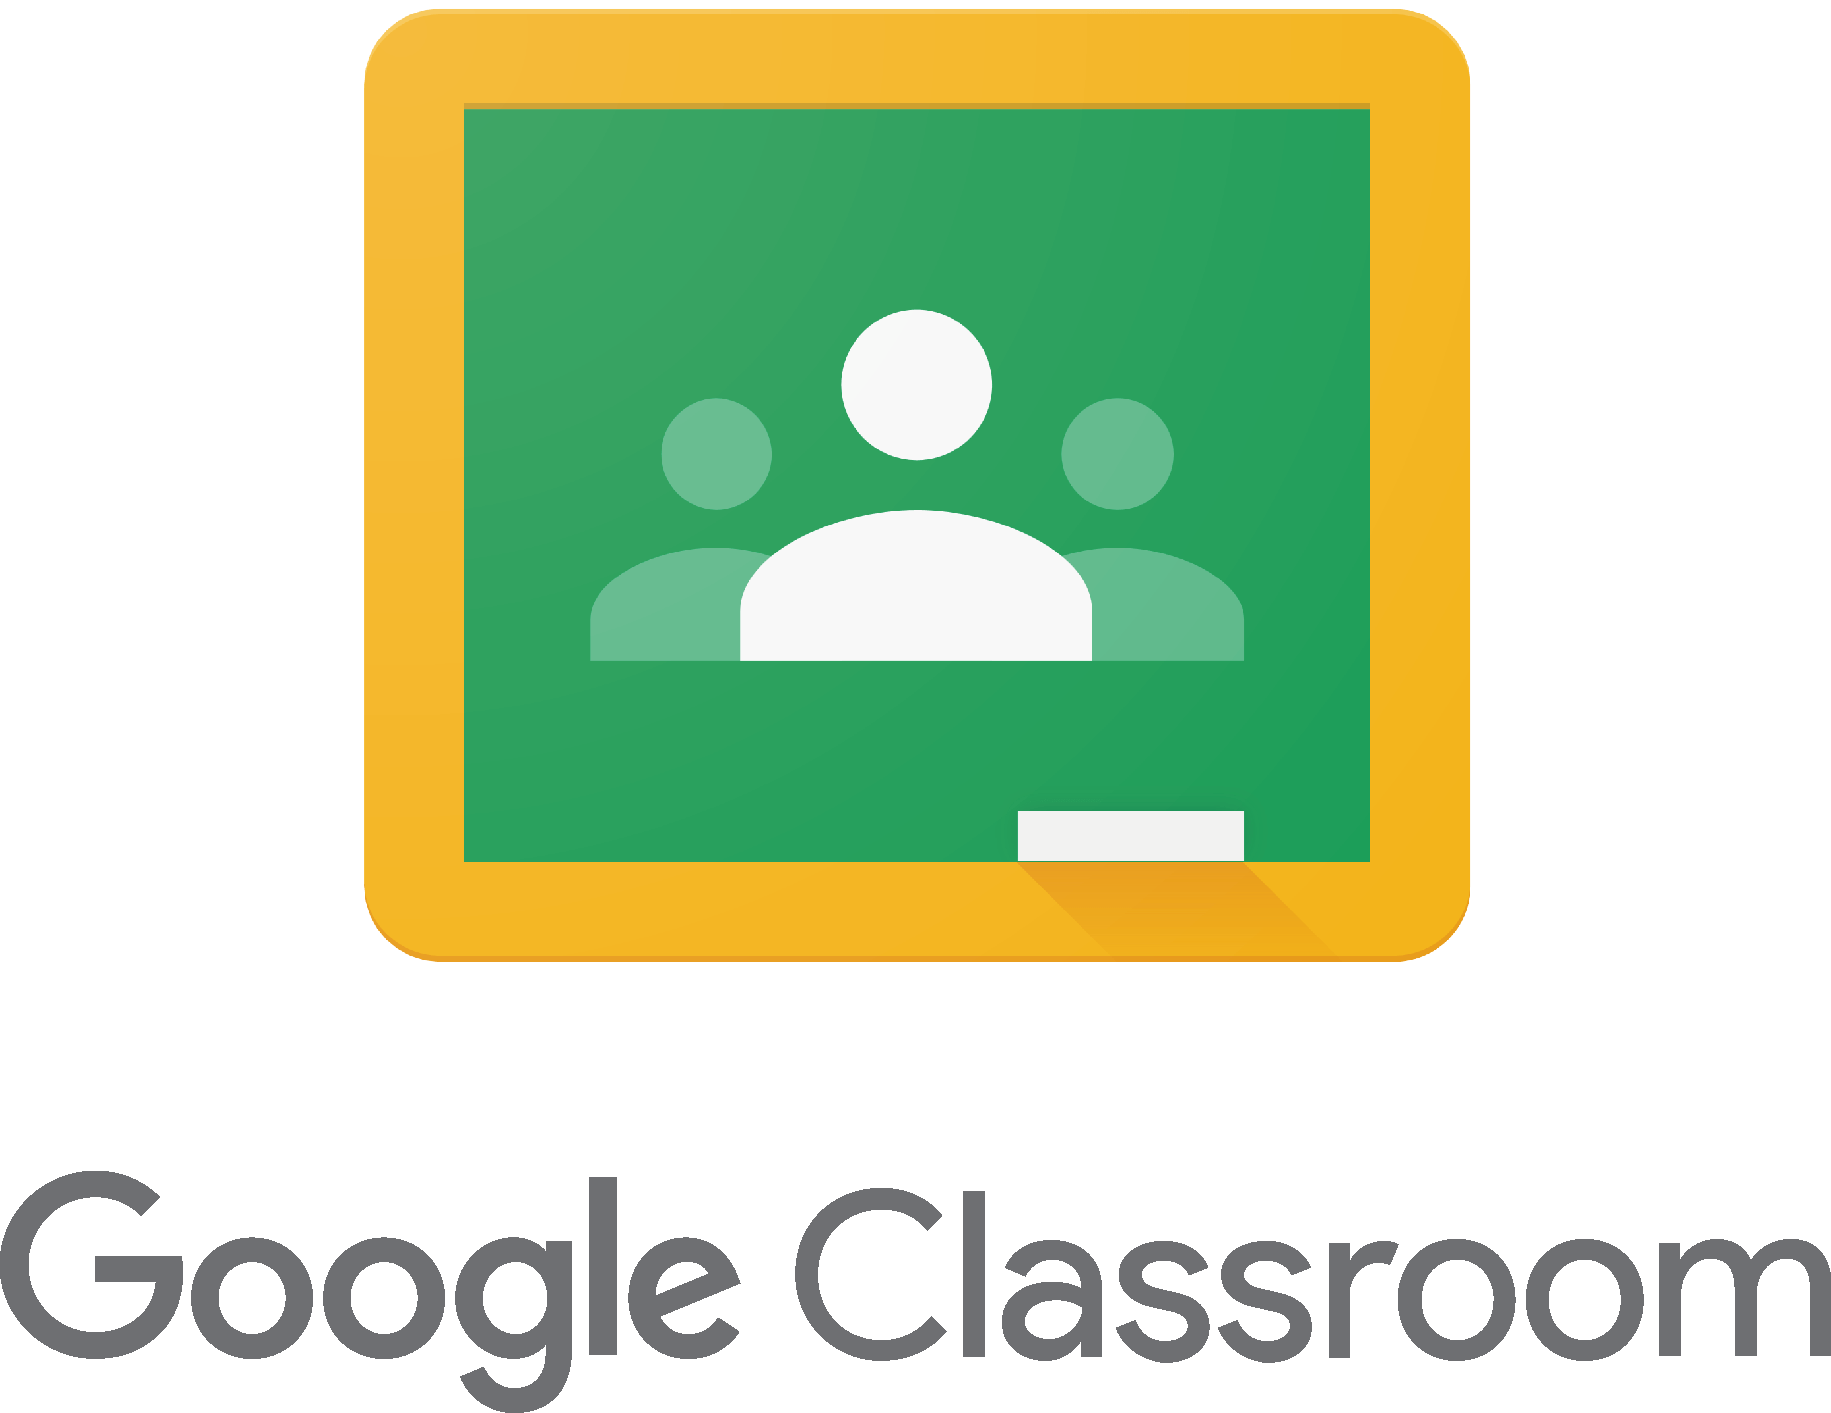 classroom-icon-e-learning-cours-a-distance-etape-pour-l-excellence-ecole-kenitra-maroc_Mesa de trabajo 1